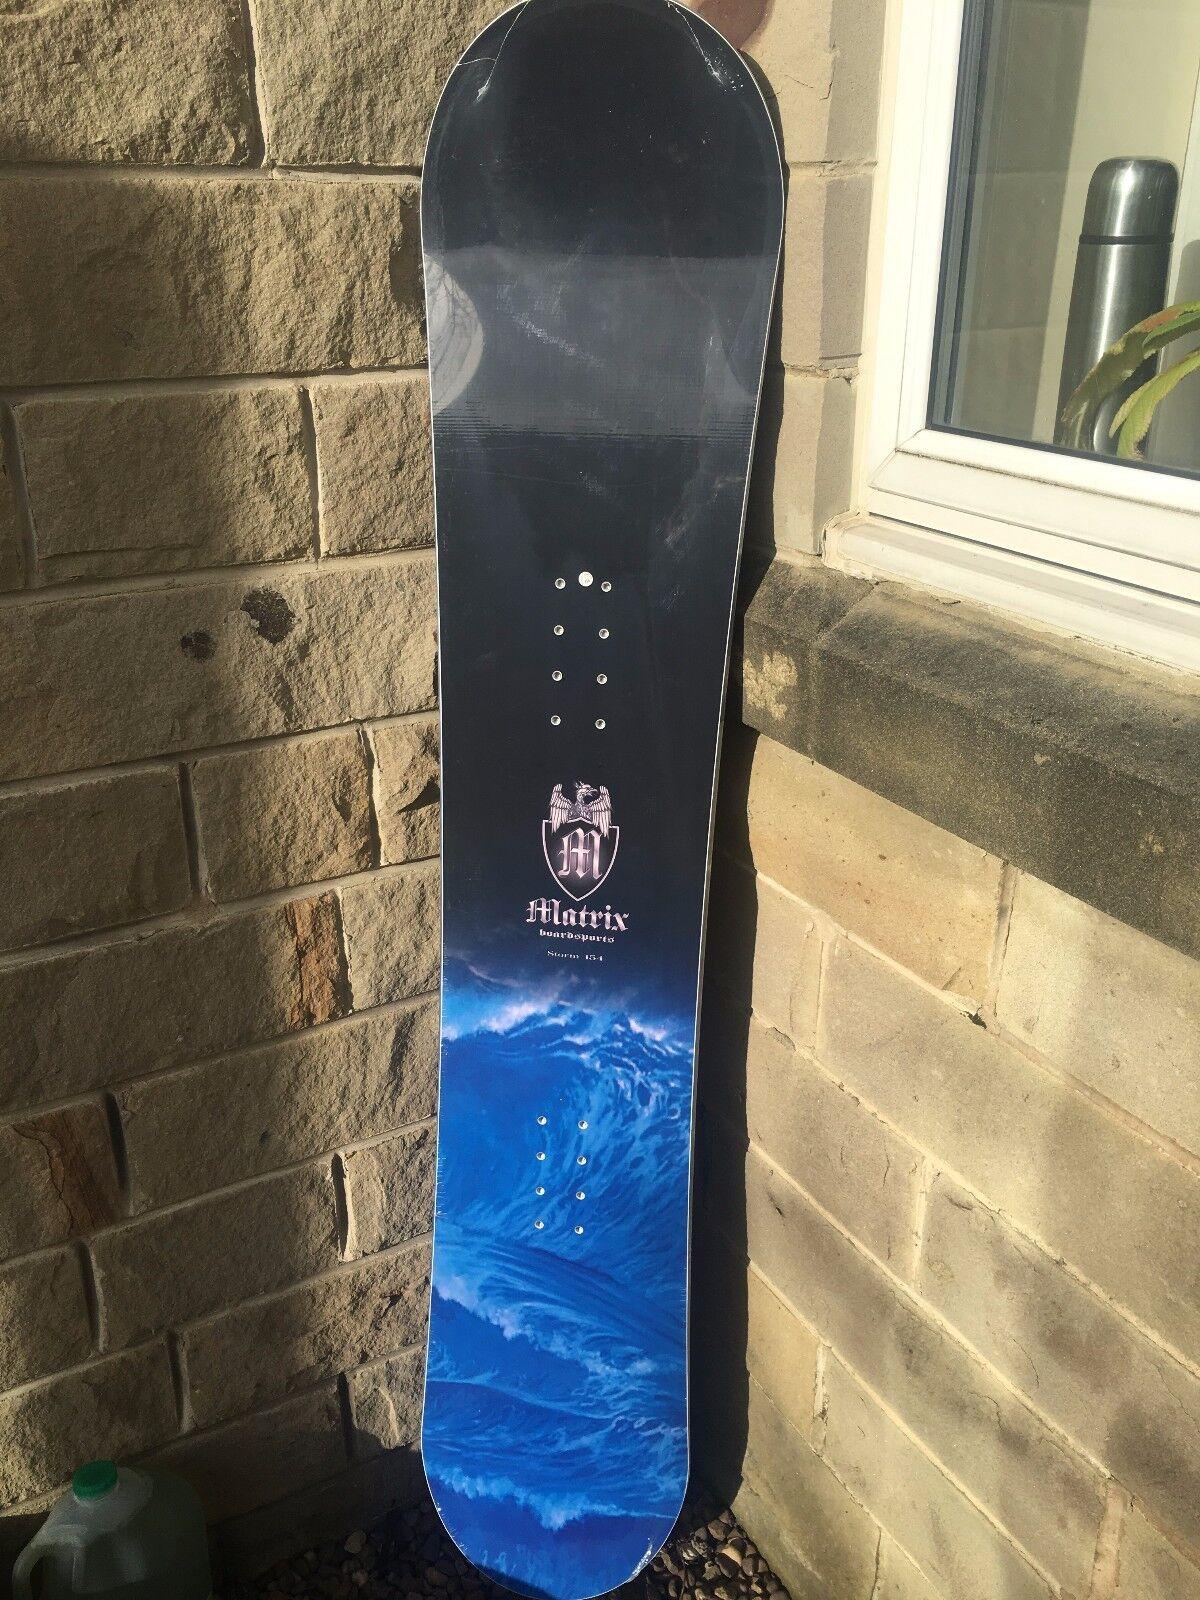 Heli Brand nieuwe Gratisride Snowboard of afmeting 156 en Model Storm and MAG Binding